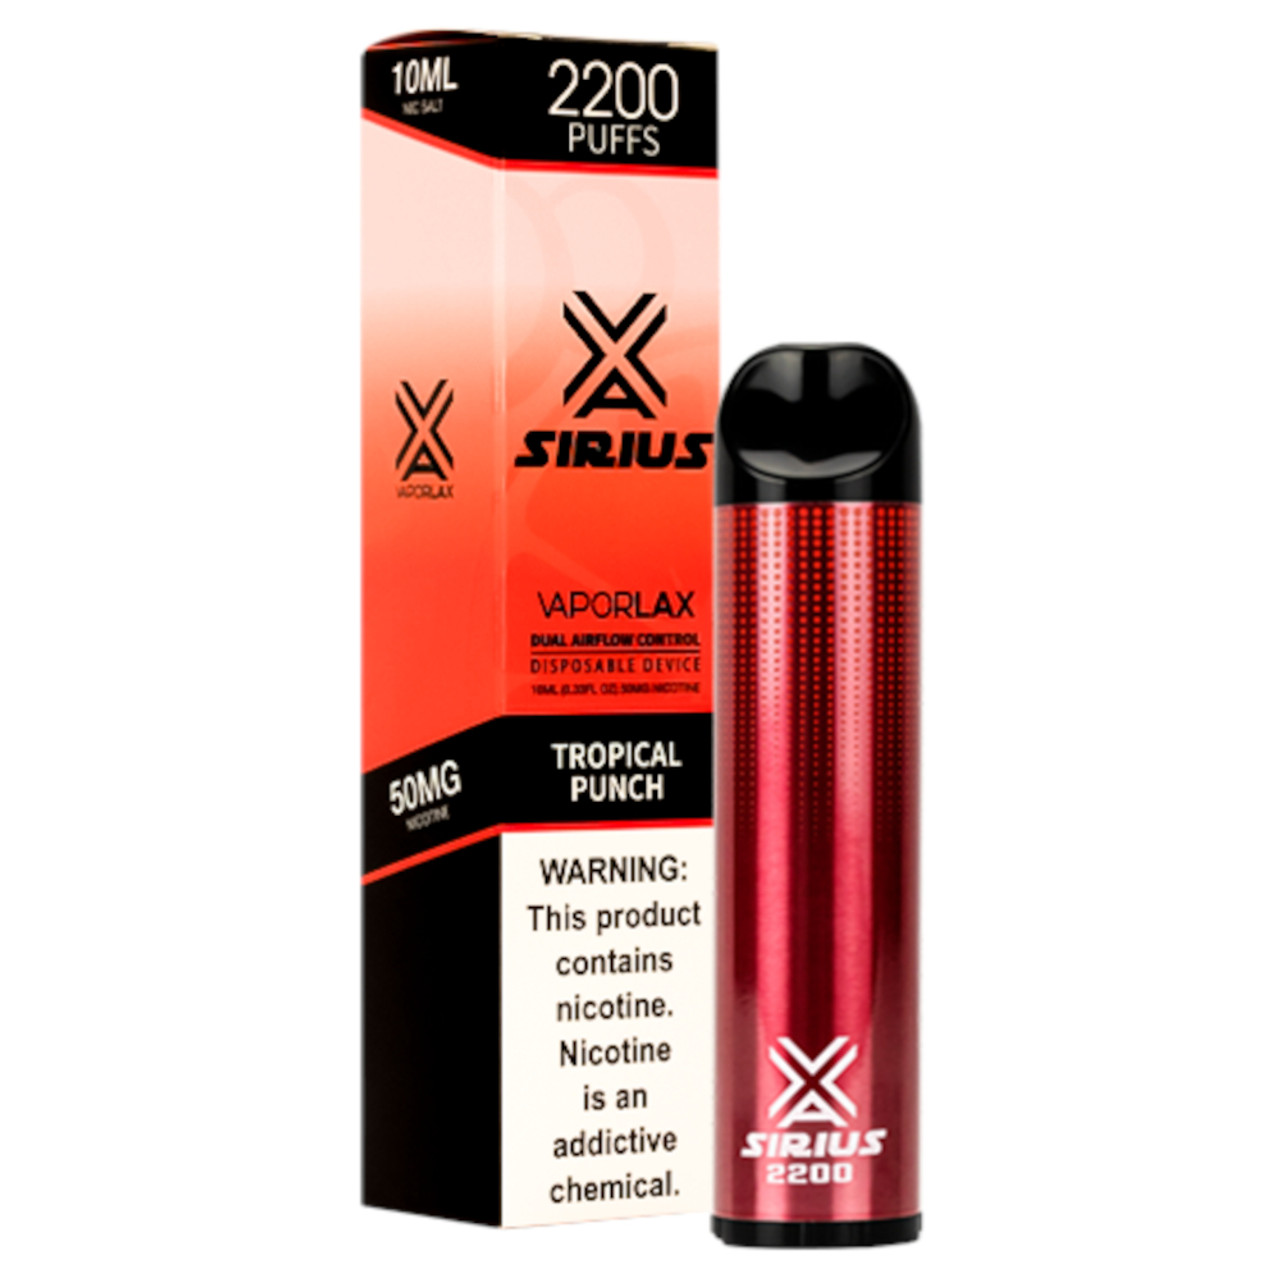 VaporLax Vape Sirius 2200 Flavored Disposables Tropical Punch Box